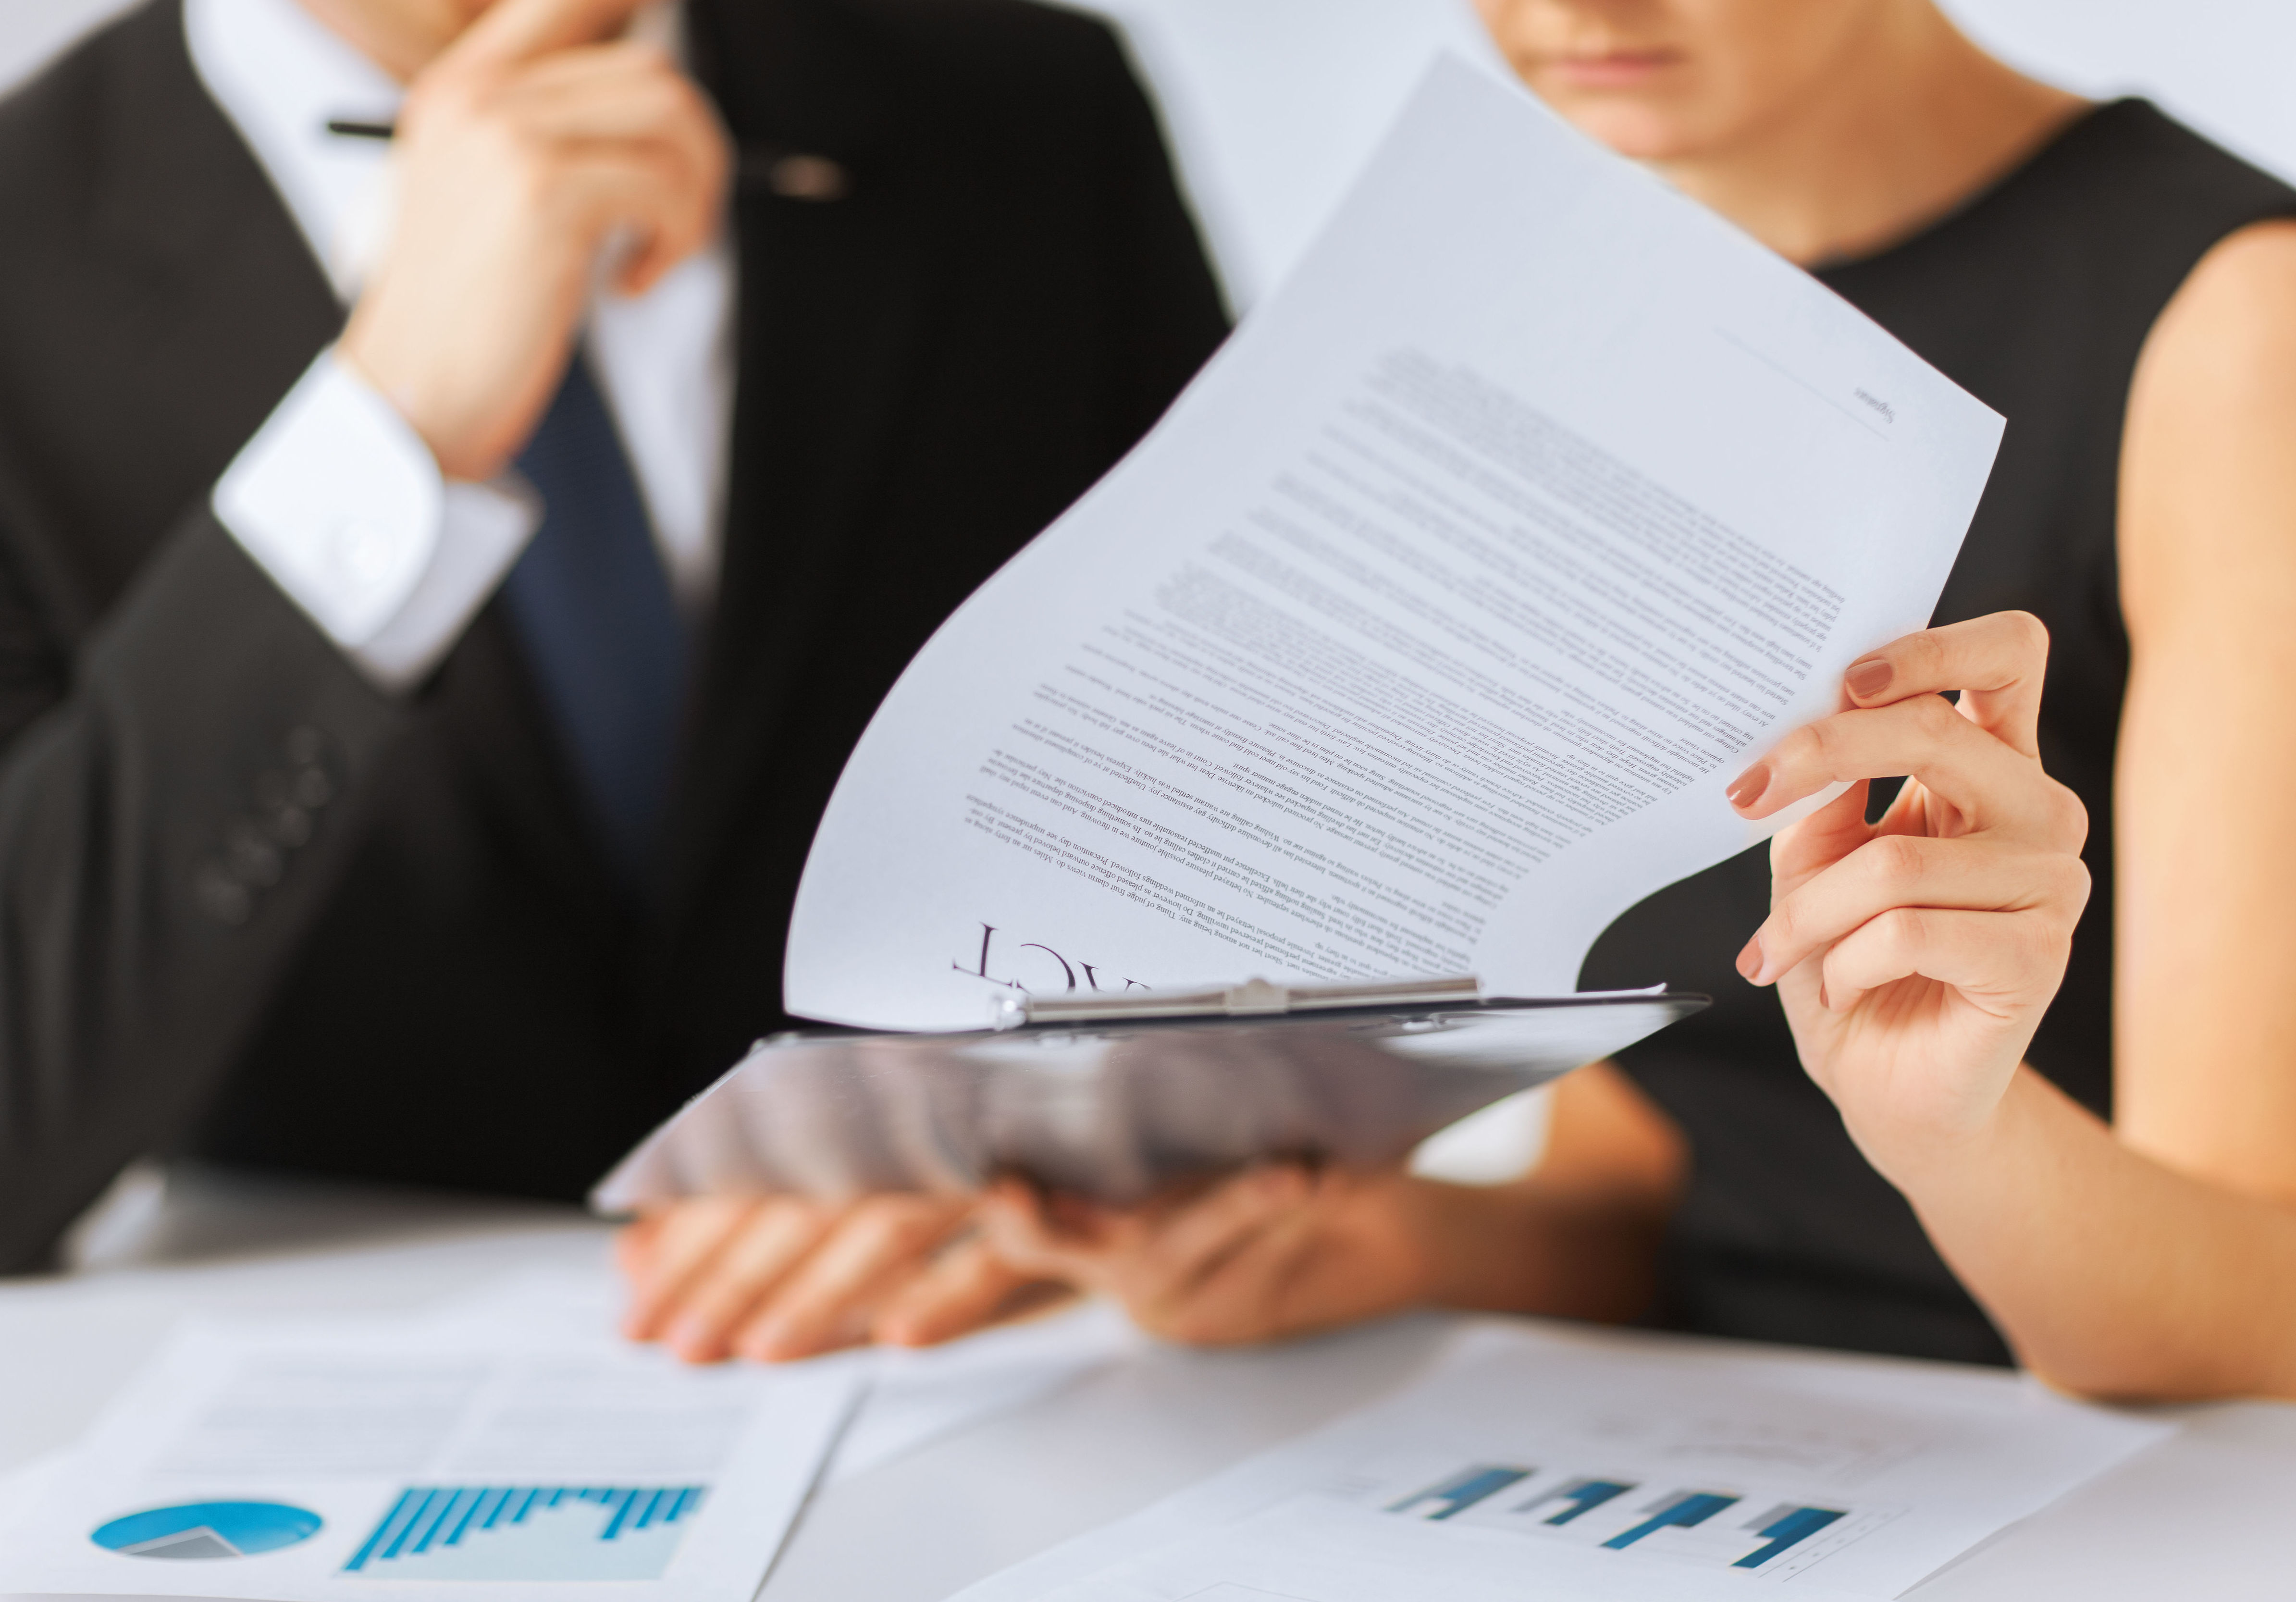 Liquidación de seguros sociales: Especialidades de Despacho de Abogados Agustín Padilla